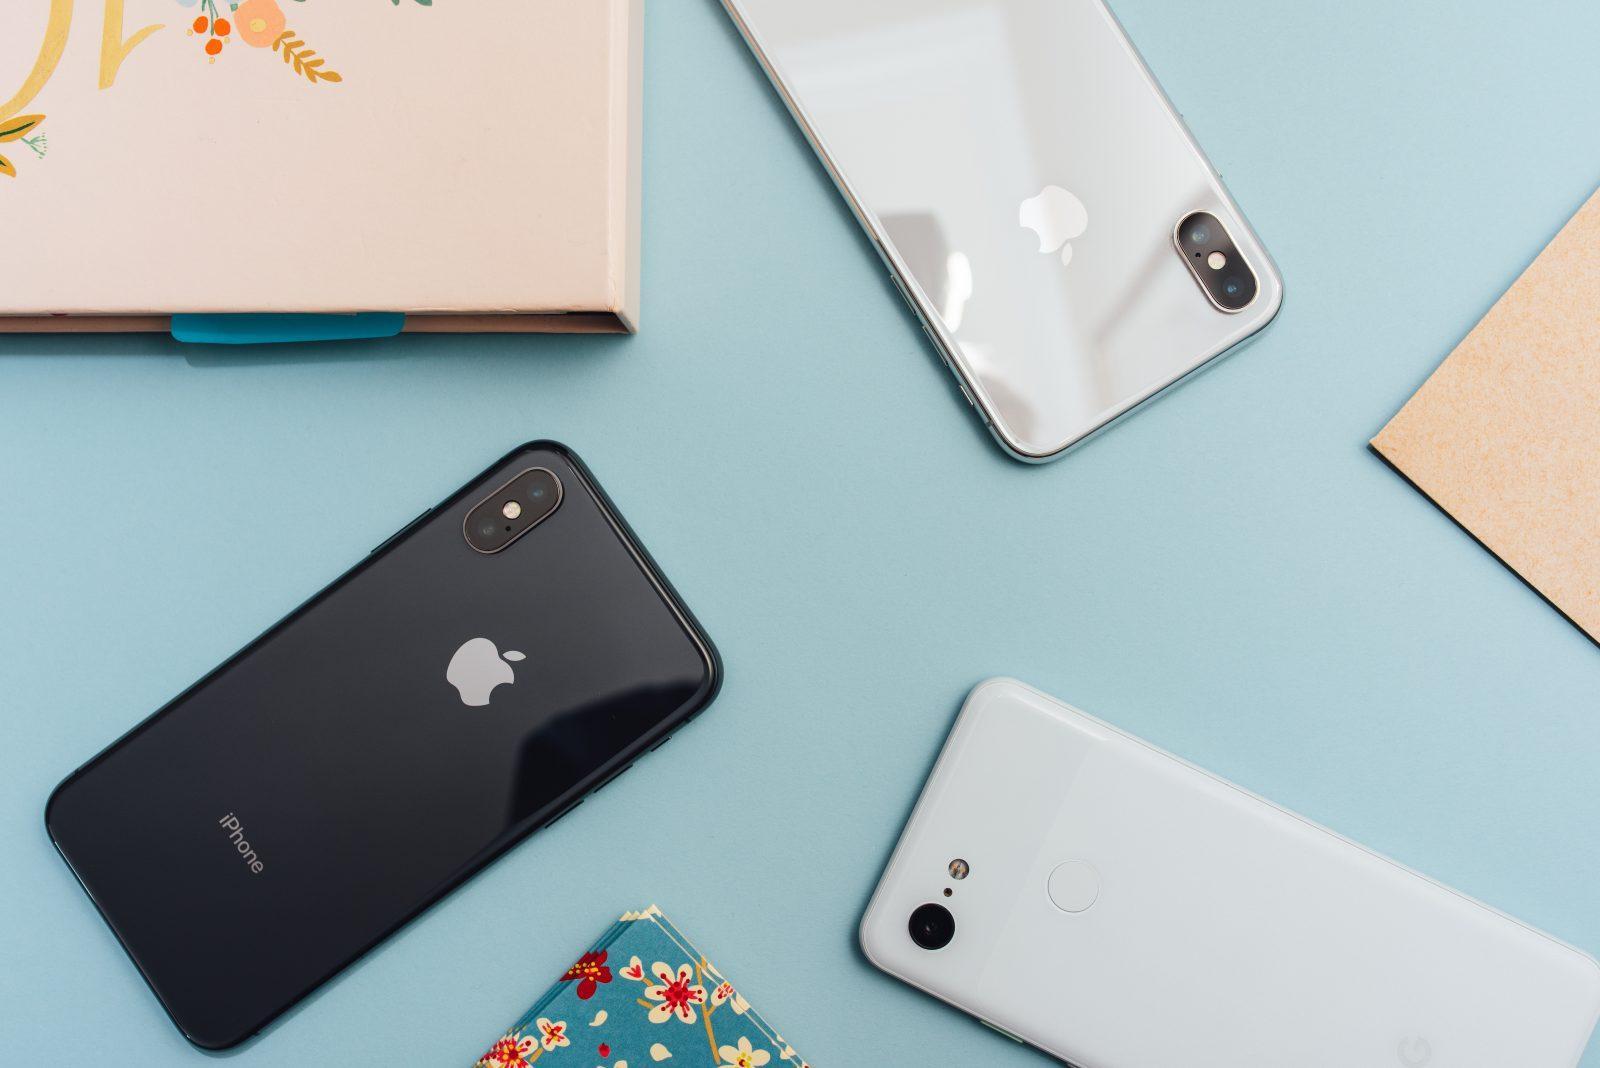 iphone aesthetic screen